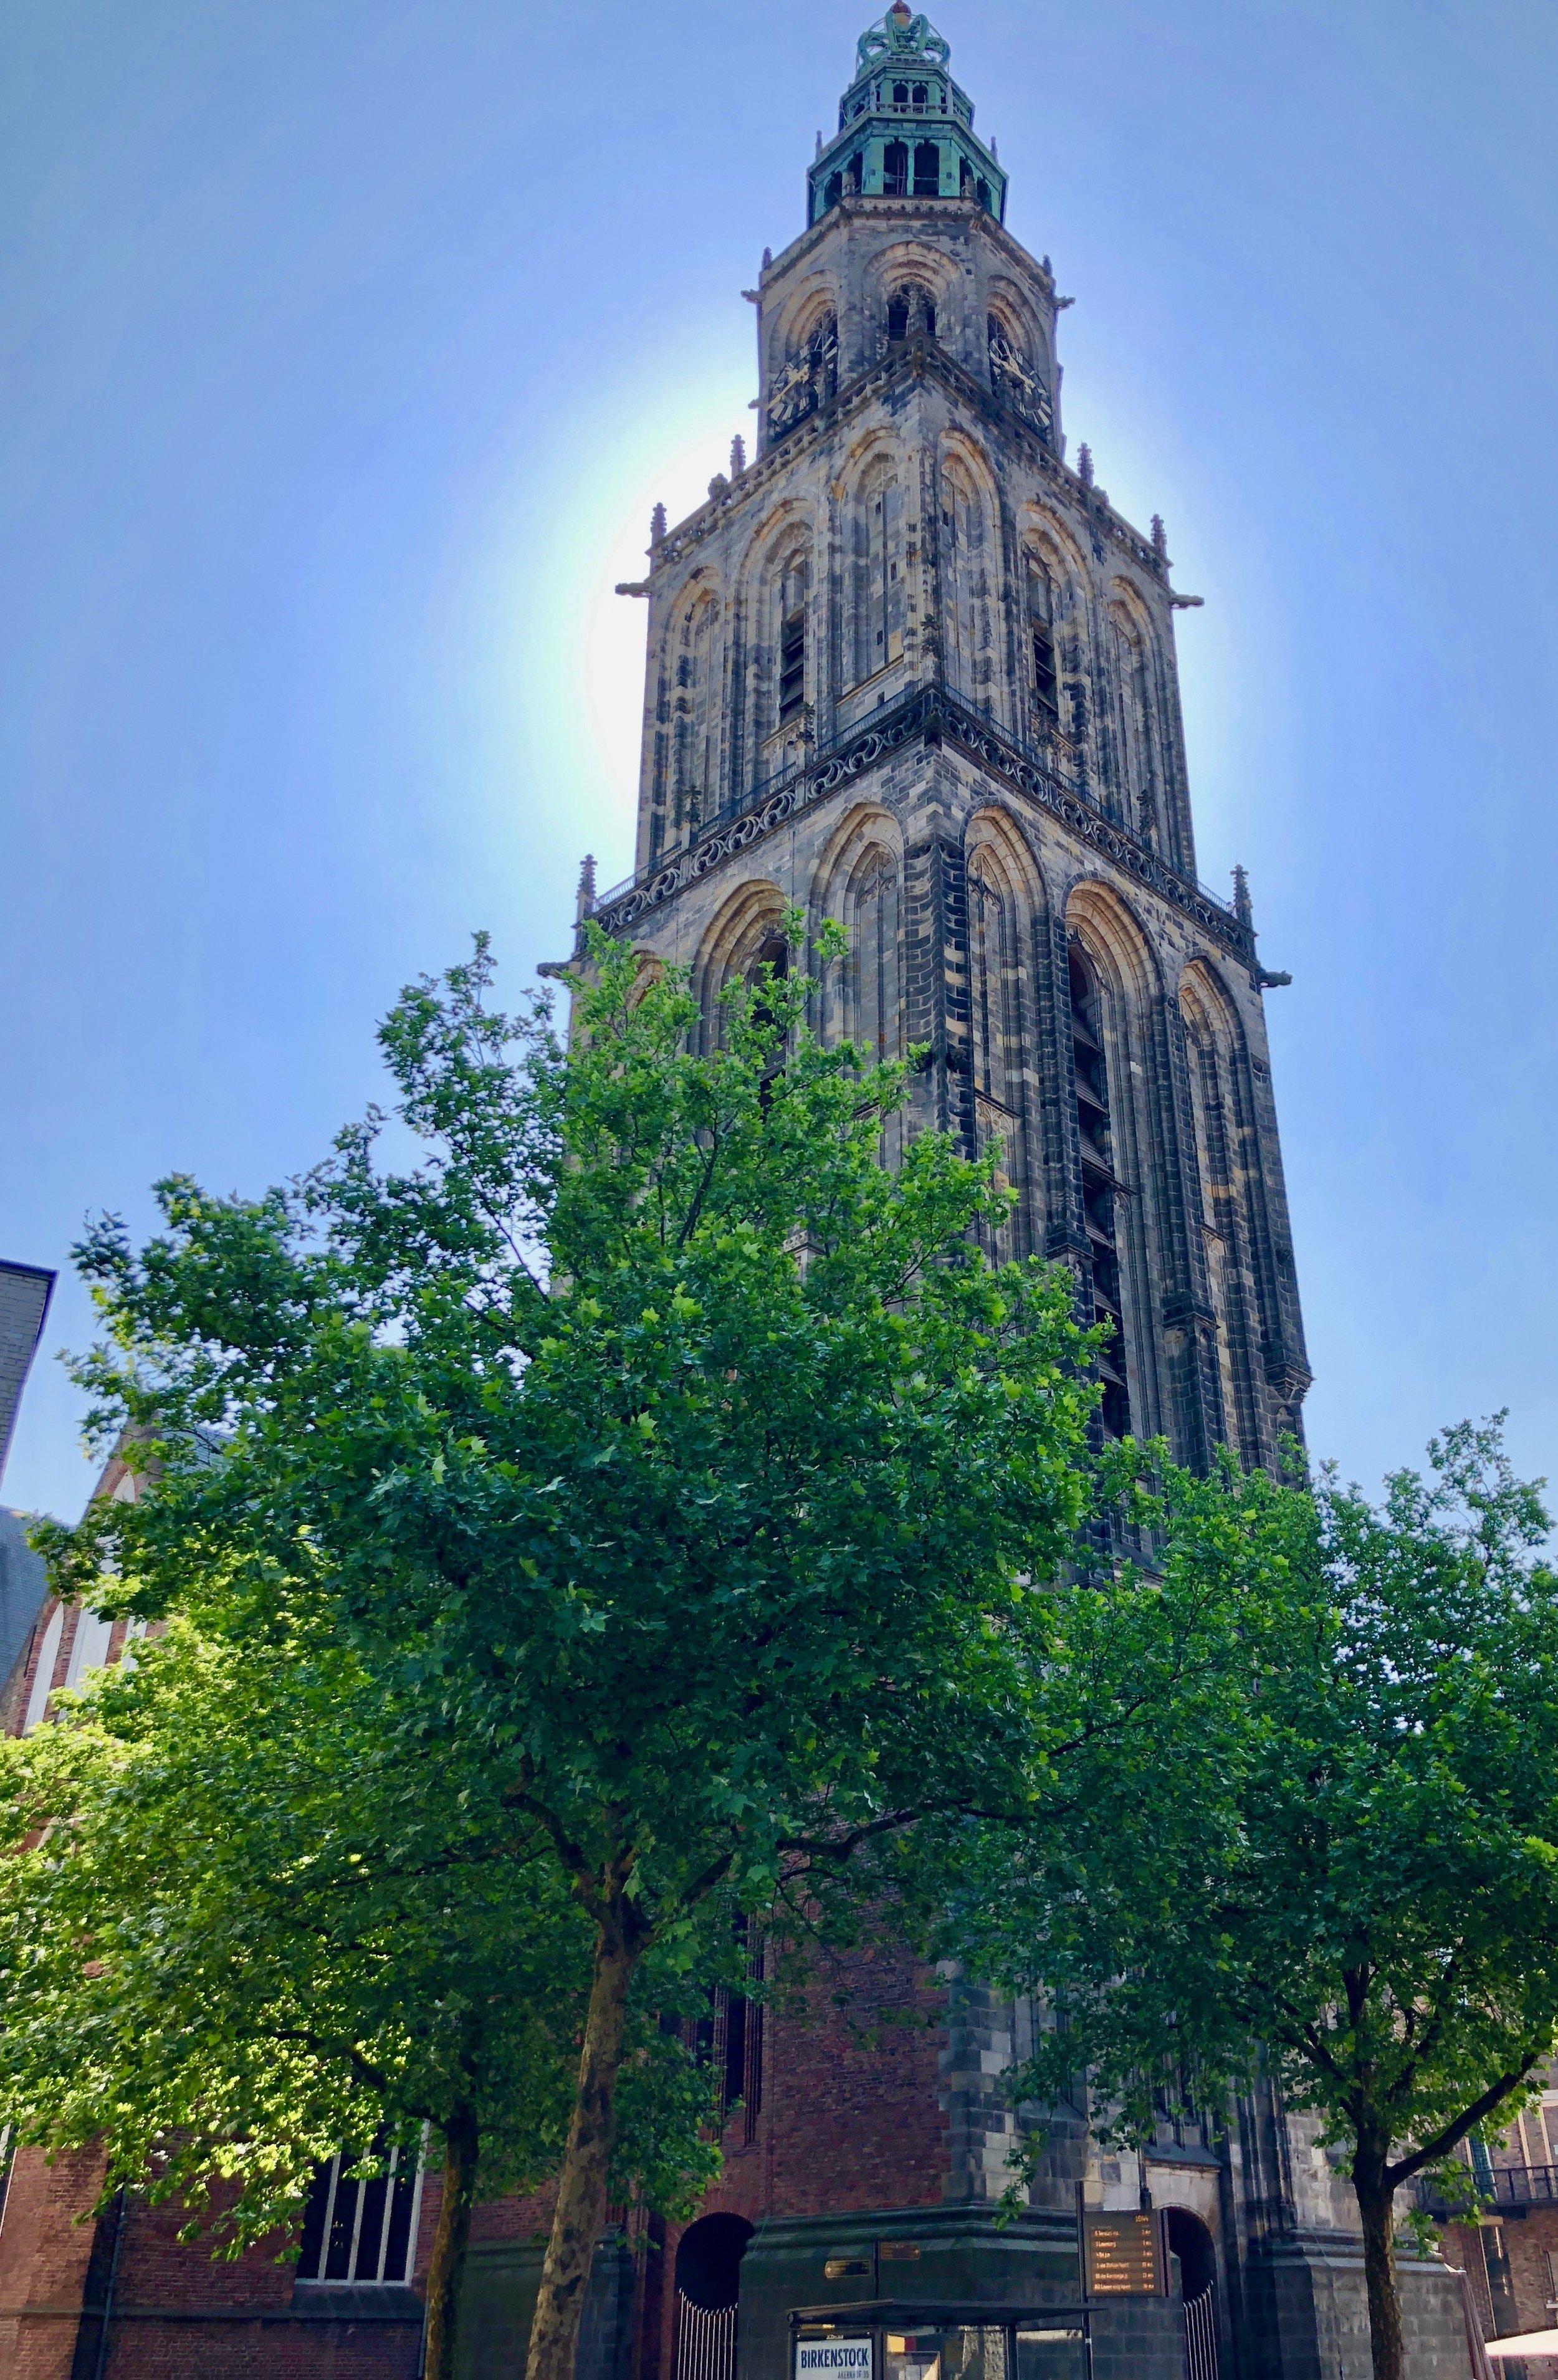 The tower of Martinikerk, Groningen.